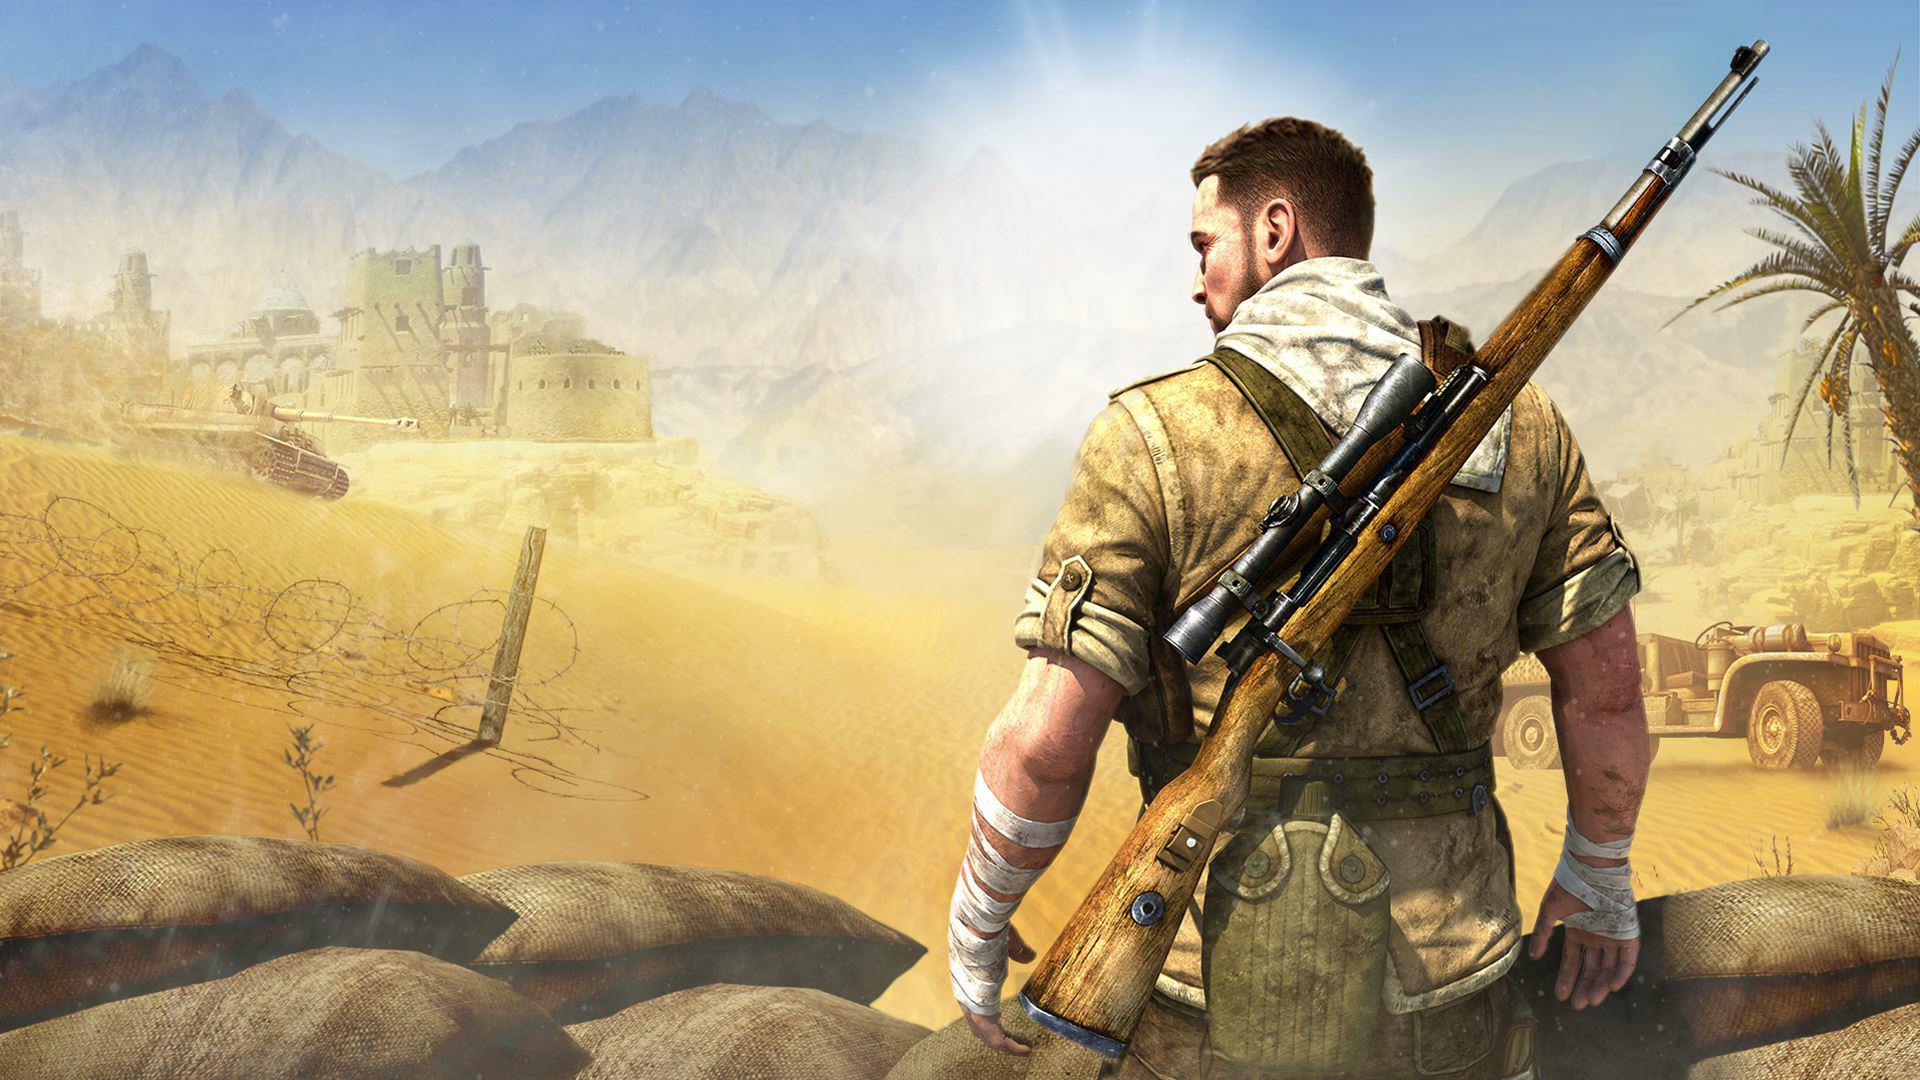 Sniper Elite 3 Wallpaper: Sniper Elite 3 HD Wallpaper